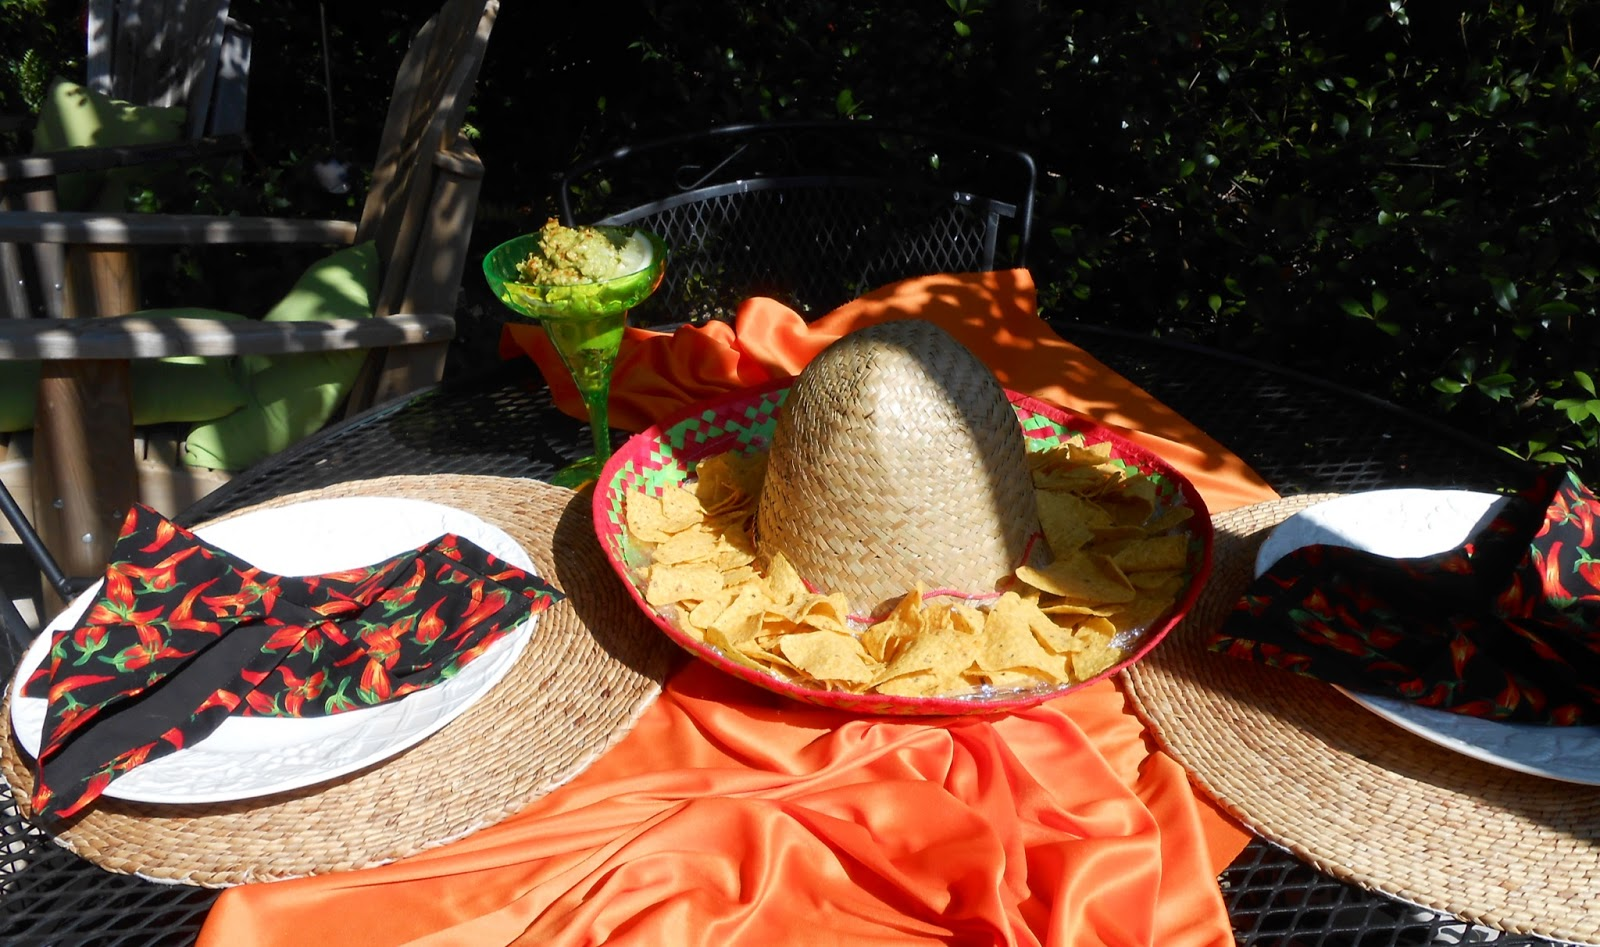 Kitty S Kozy Kitchen Guacamole For Cinco De Mayo